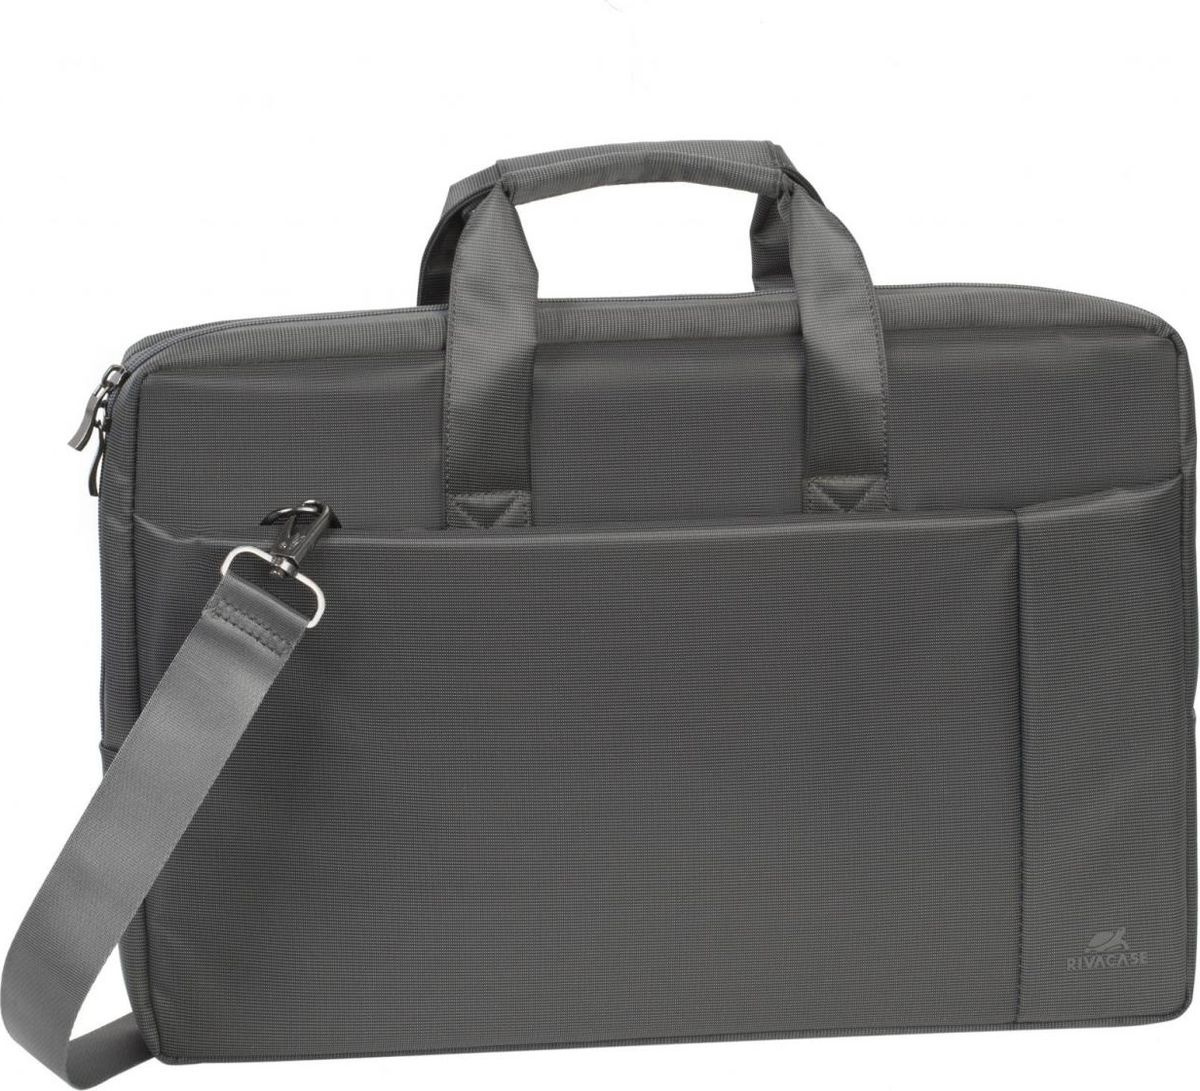 f77f2e307498 RivaCase 8251, Grey сумка для ноутбука 17,3